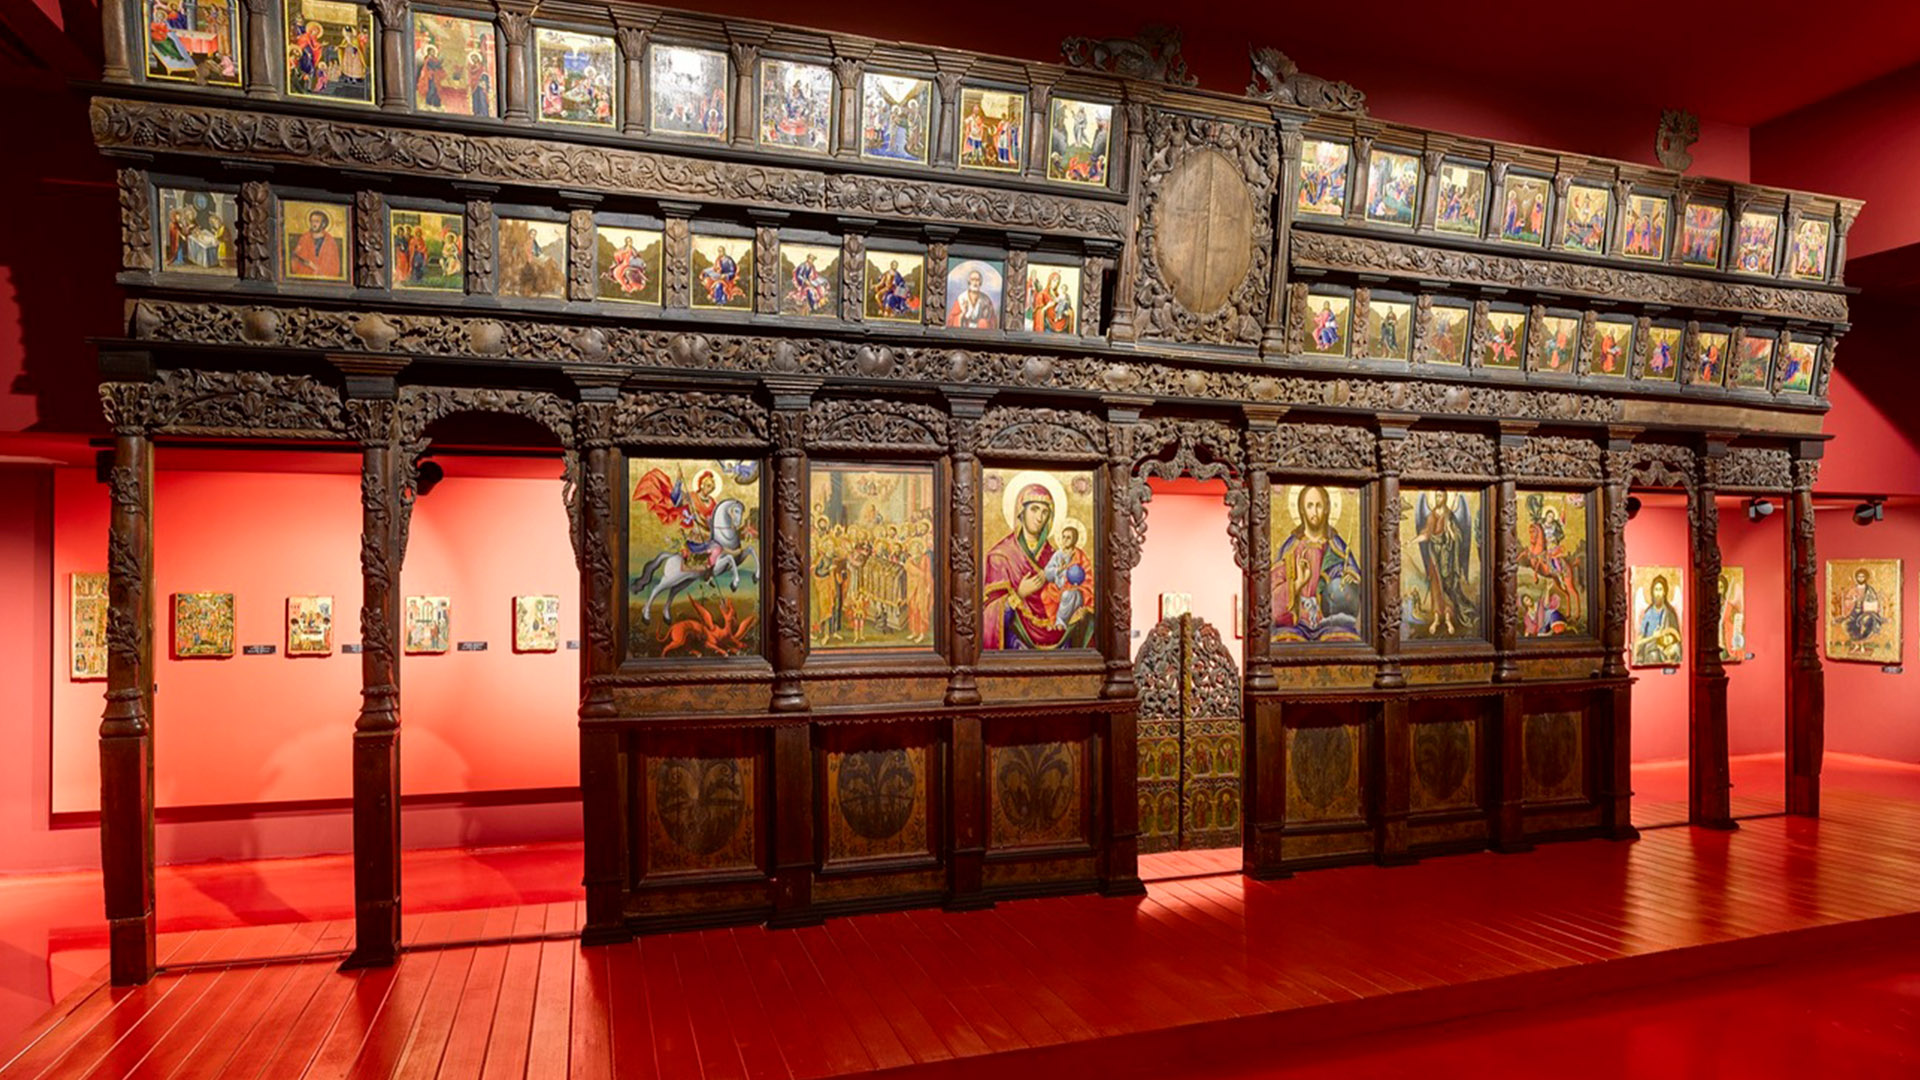 Day8-Leskovik-Korce_0000s_0000_National Museum of Medieval -4